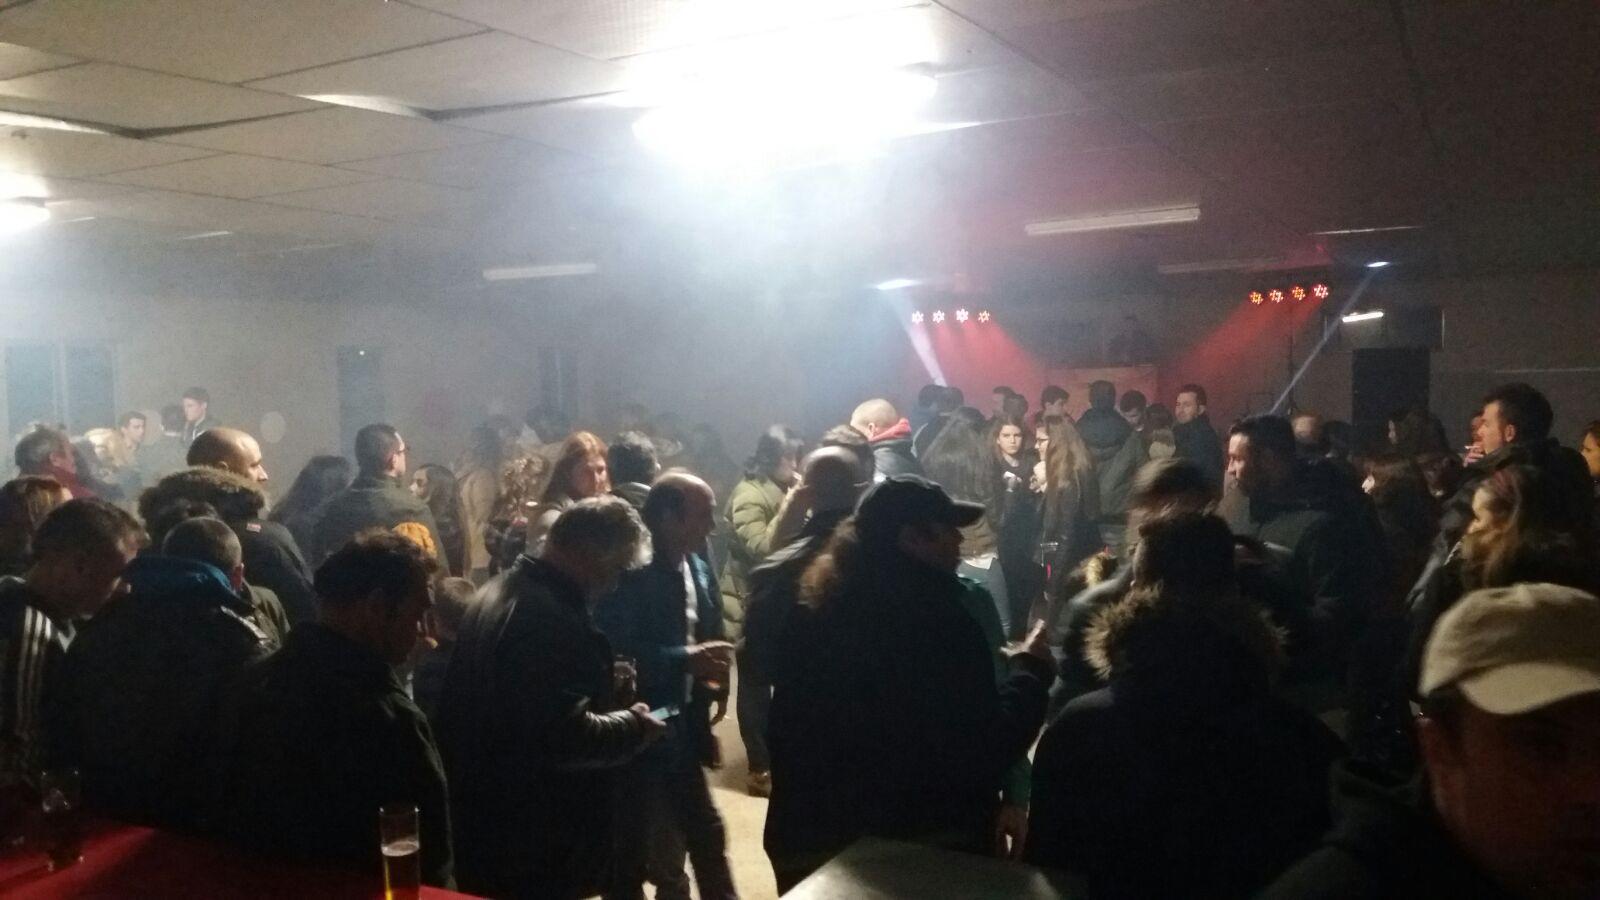 27-02-16 Francos fiesta benefica3